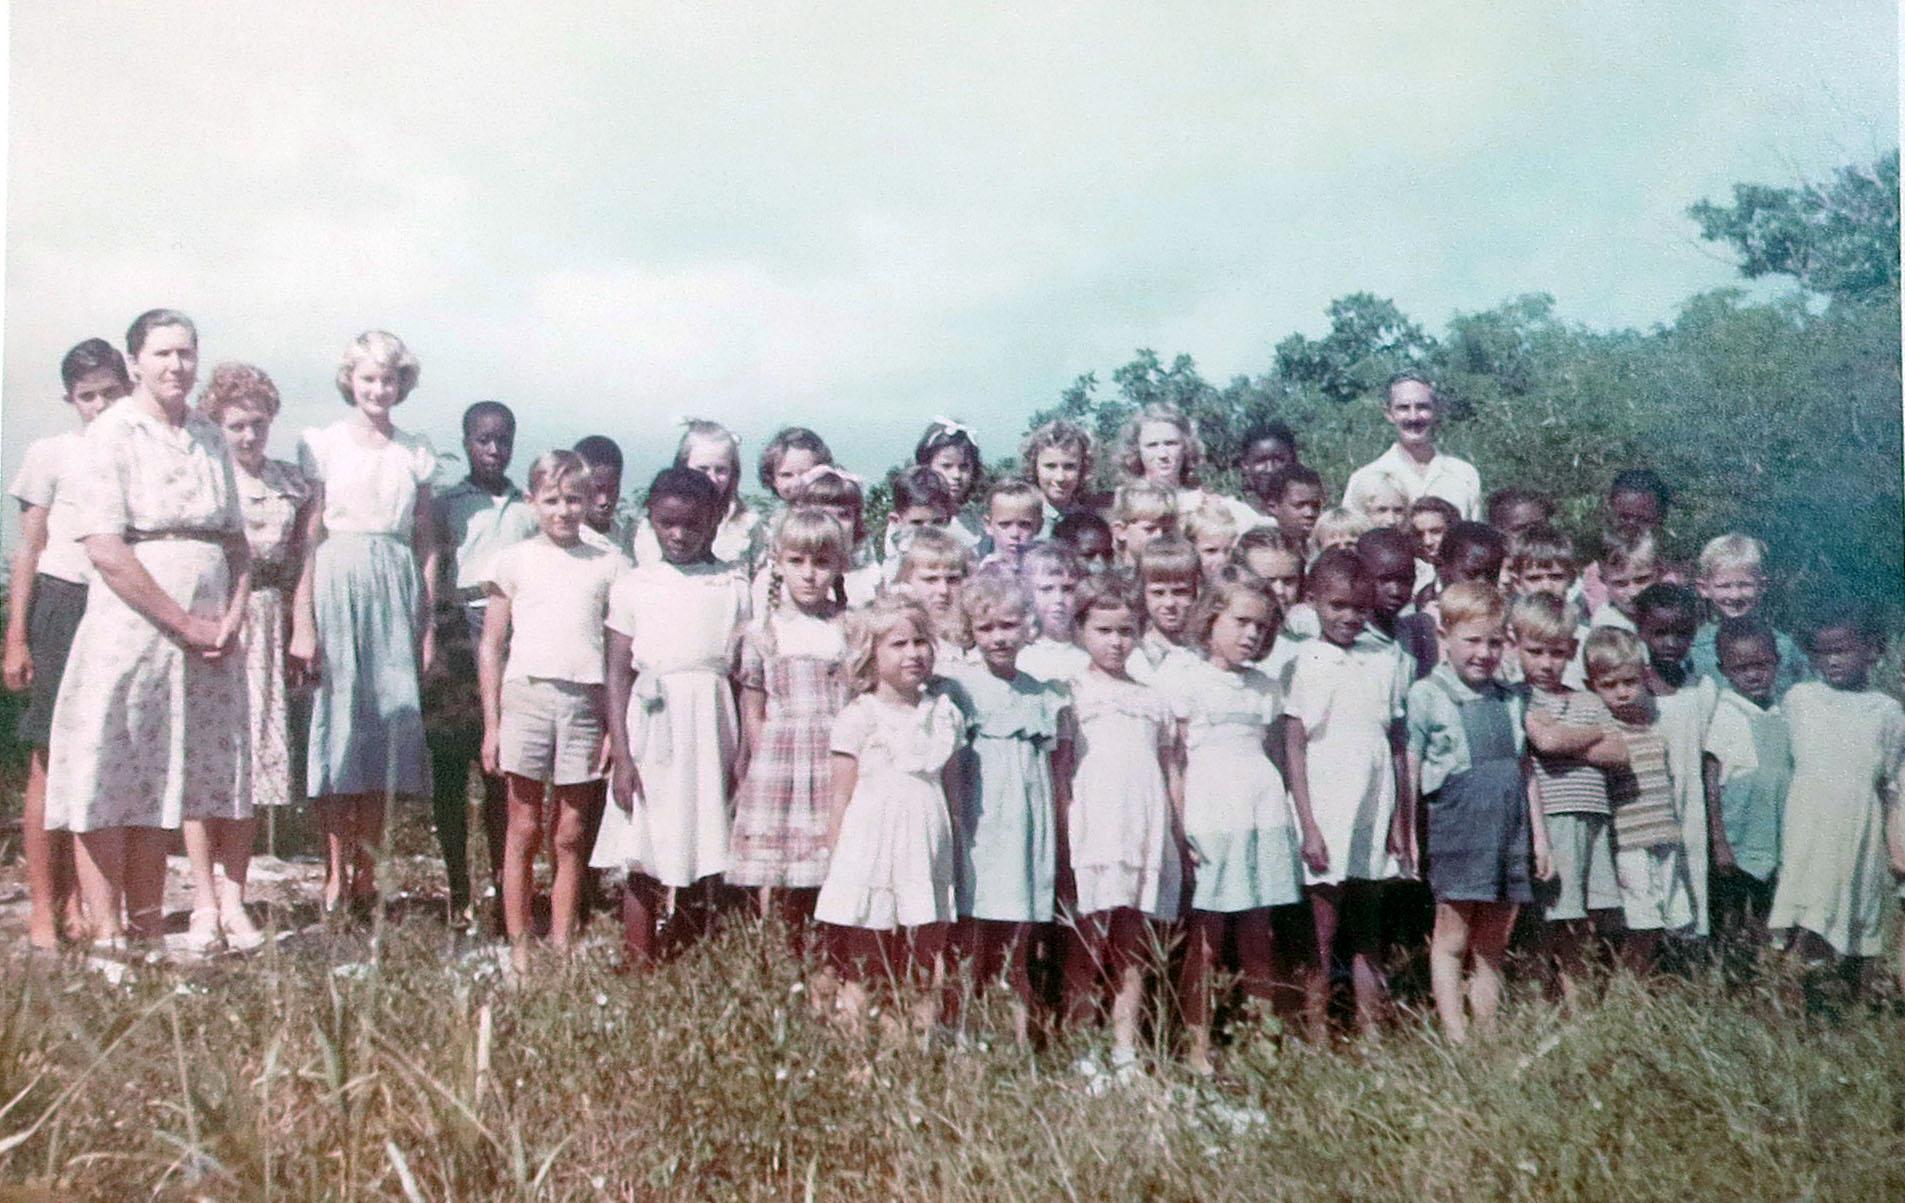 Primary School Students, Green Turtle Cay (circa 1950)